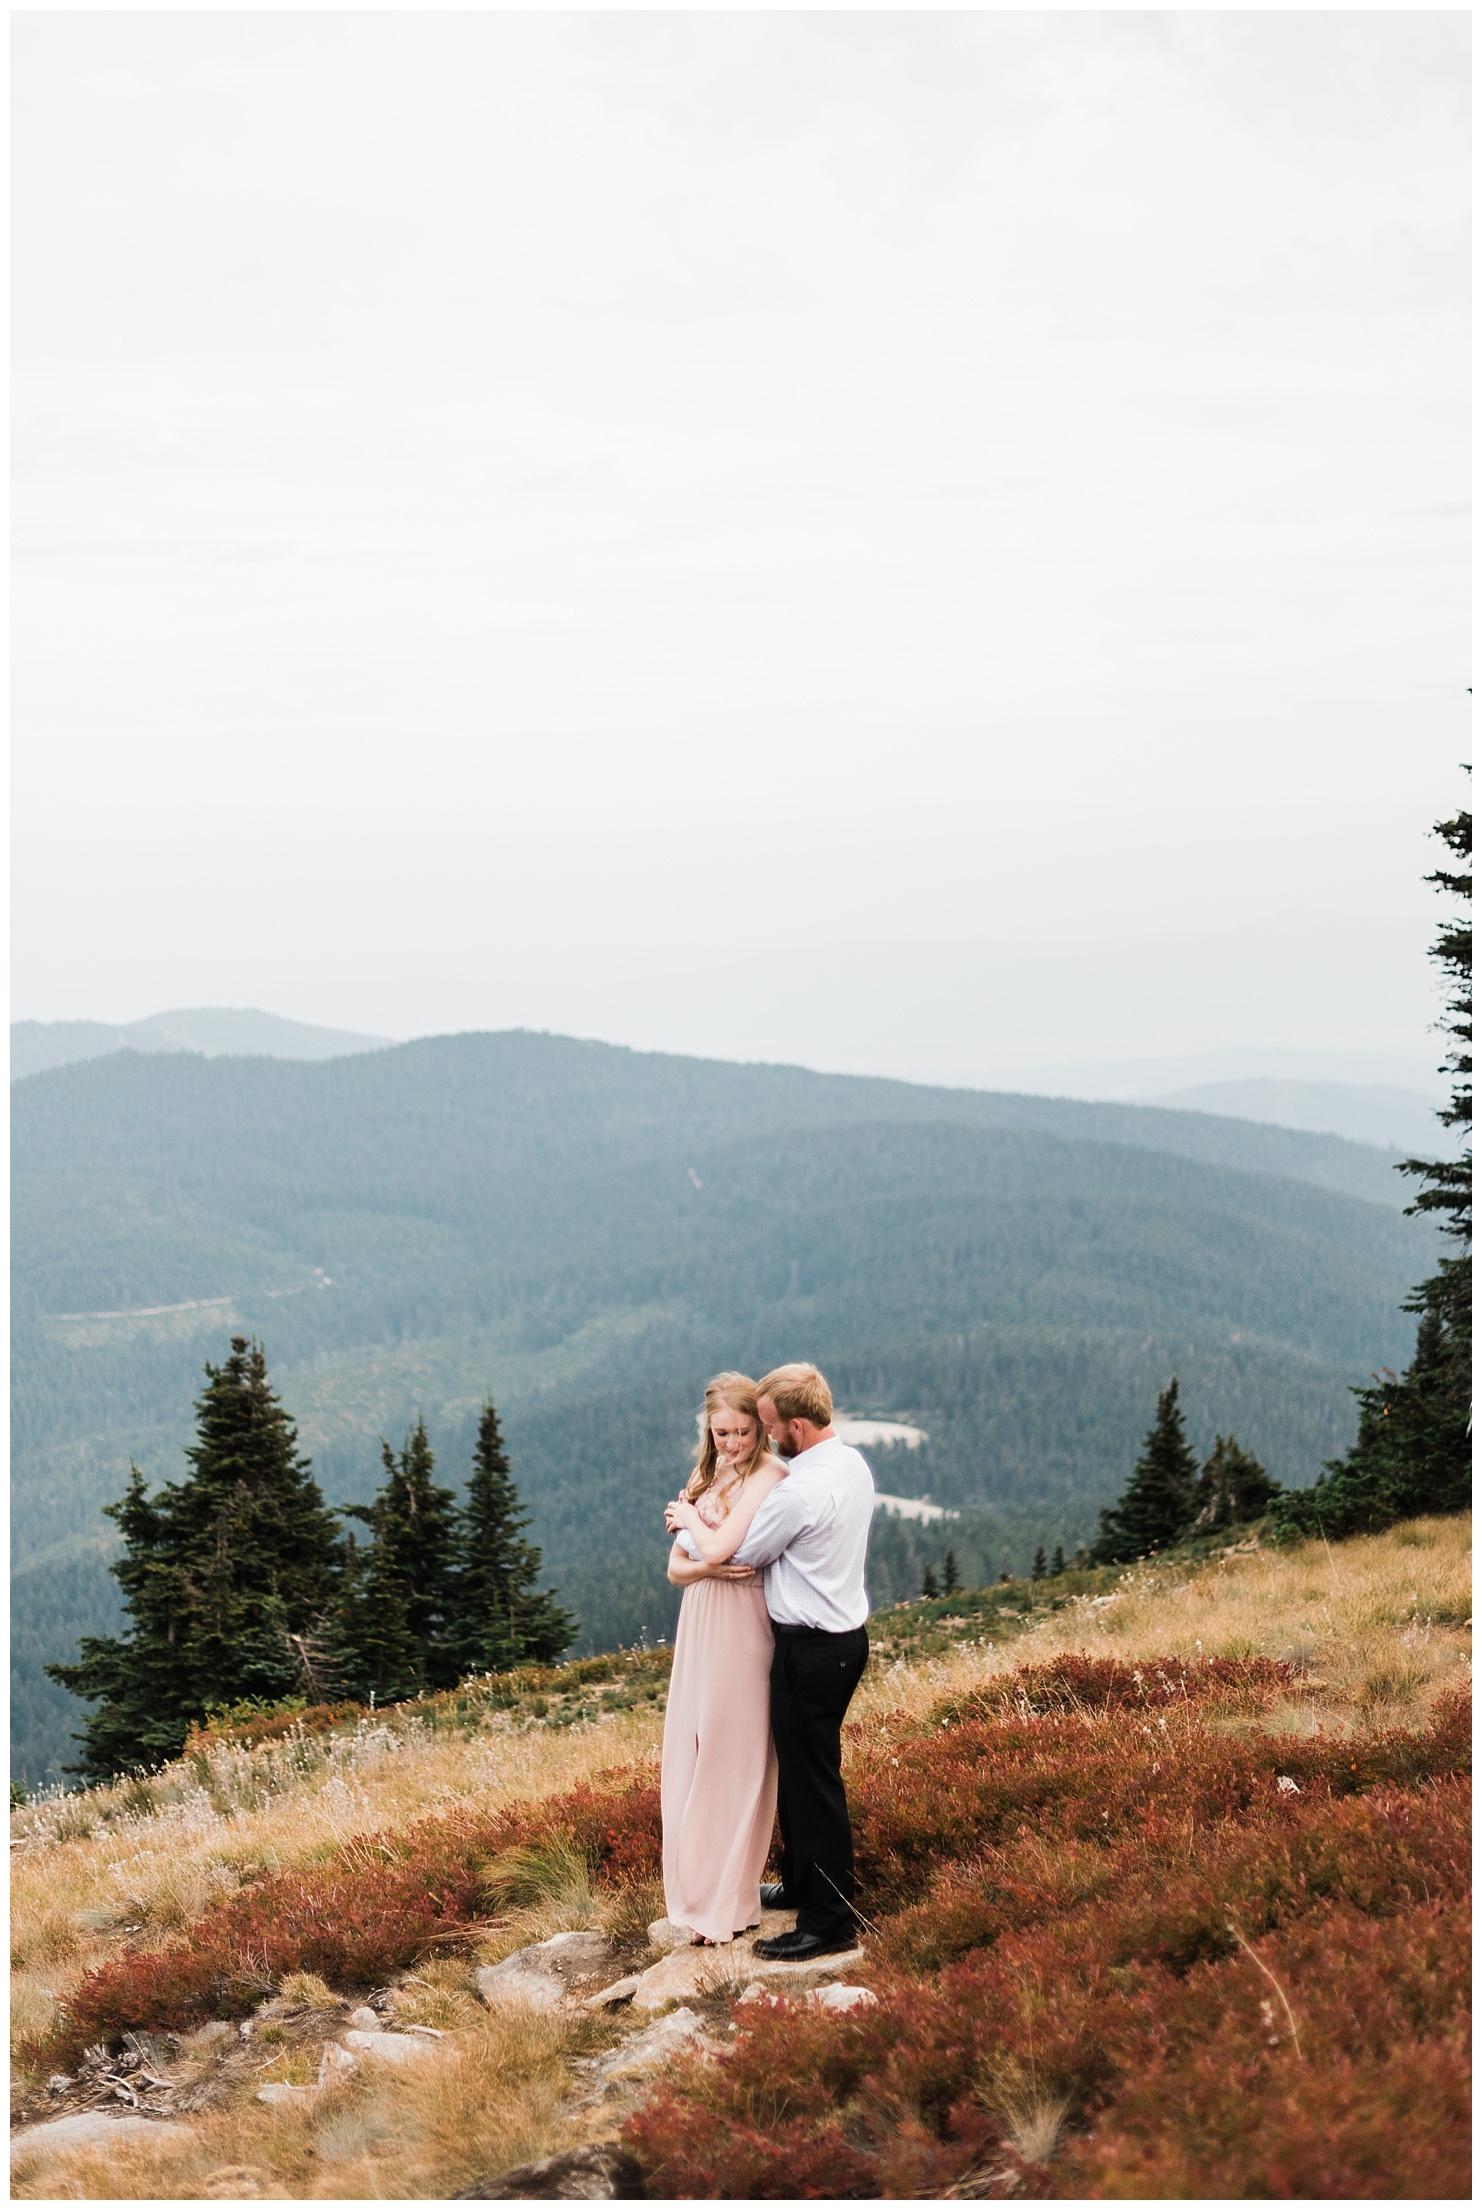 Mt Spokane Engagement Session 3